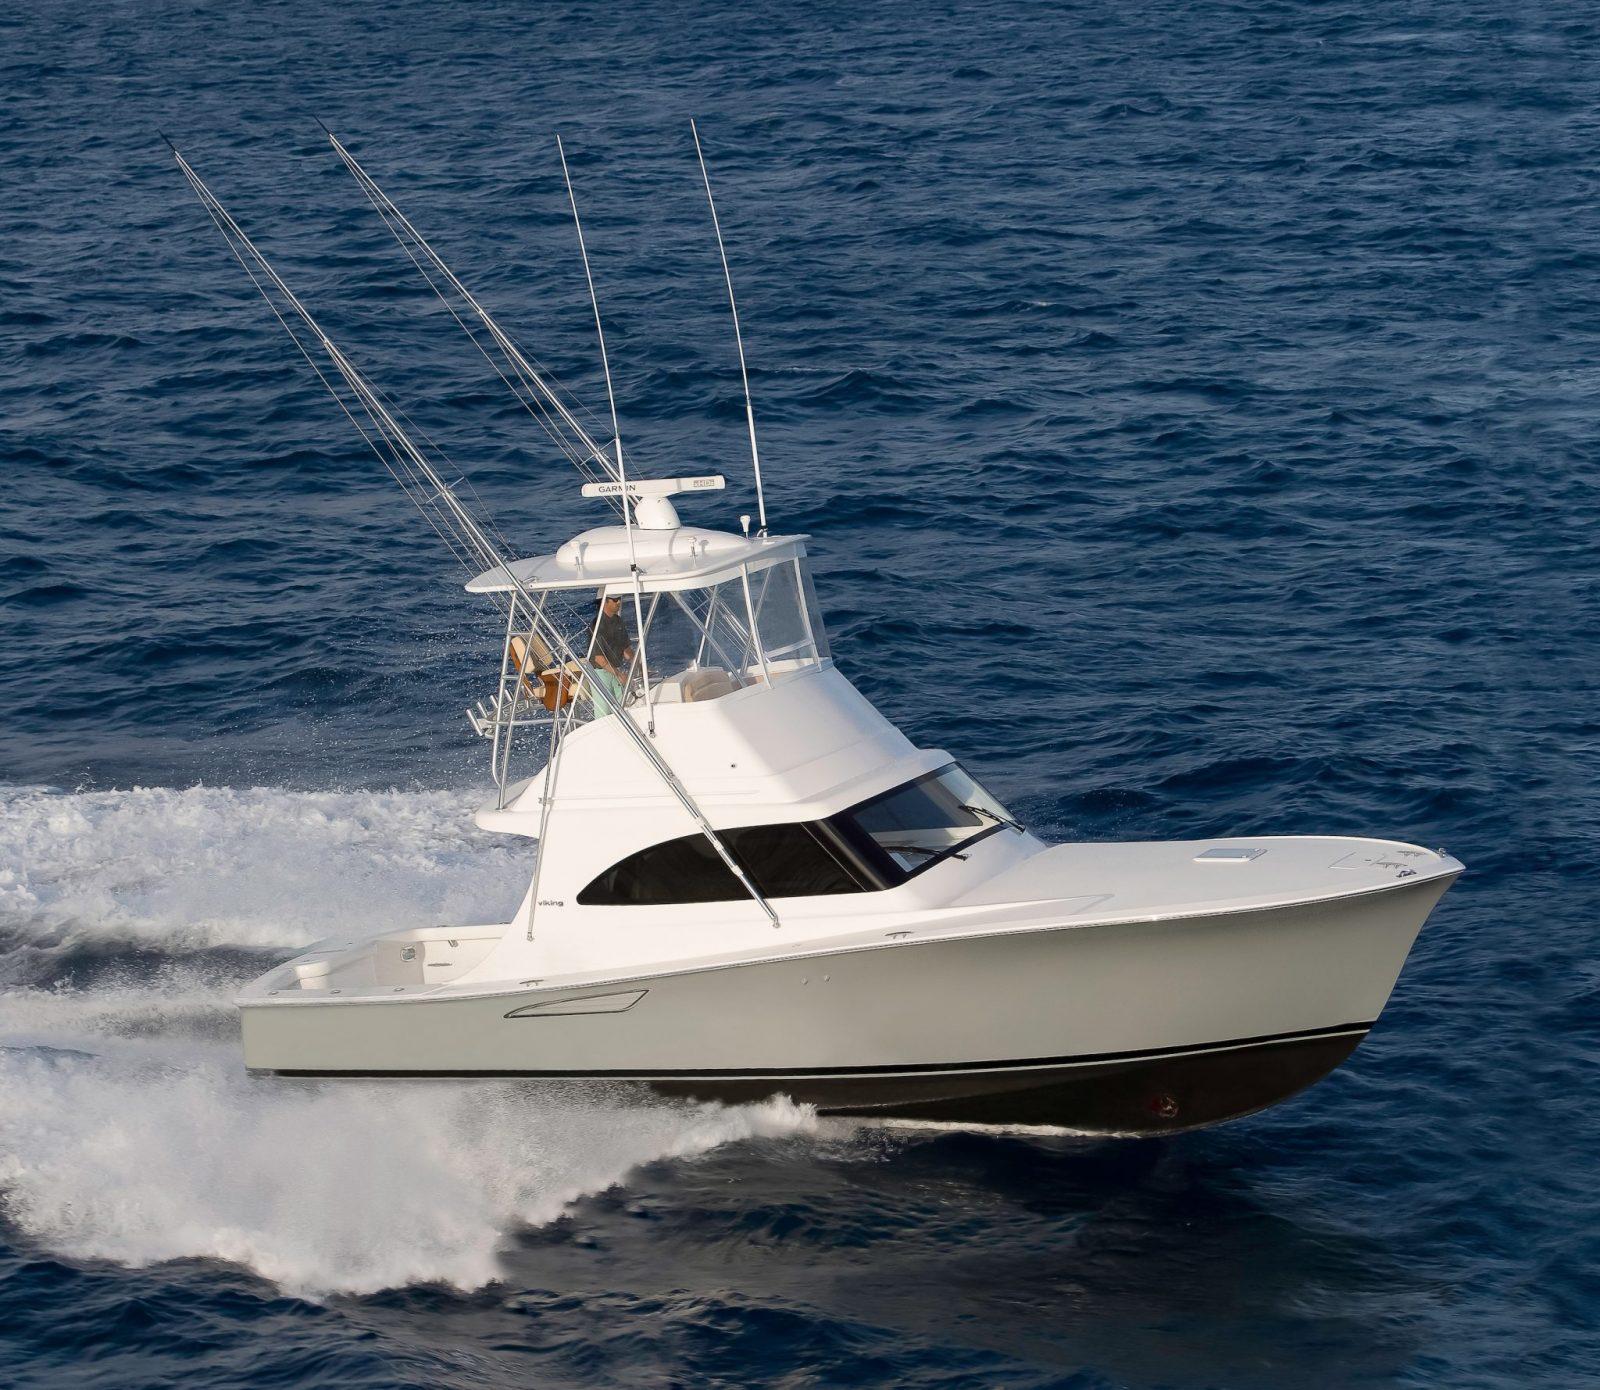 37BF-1 | 37 Billfish